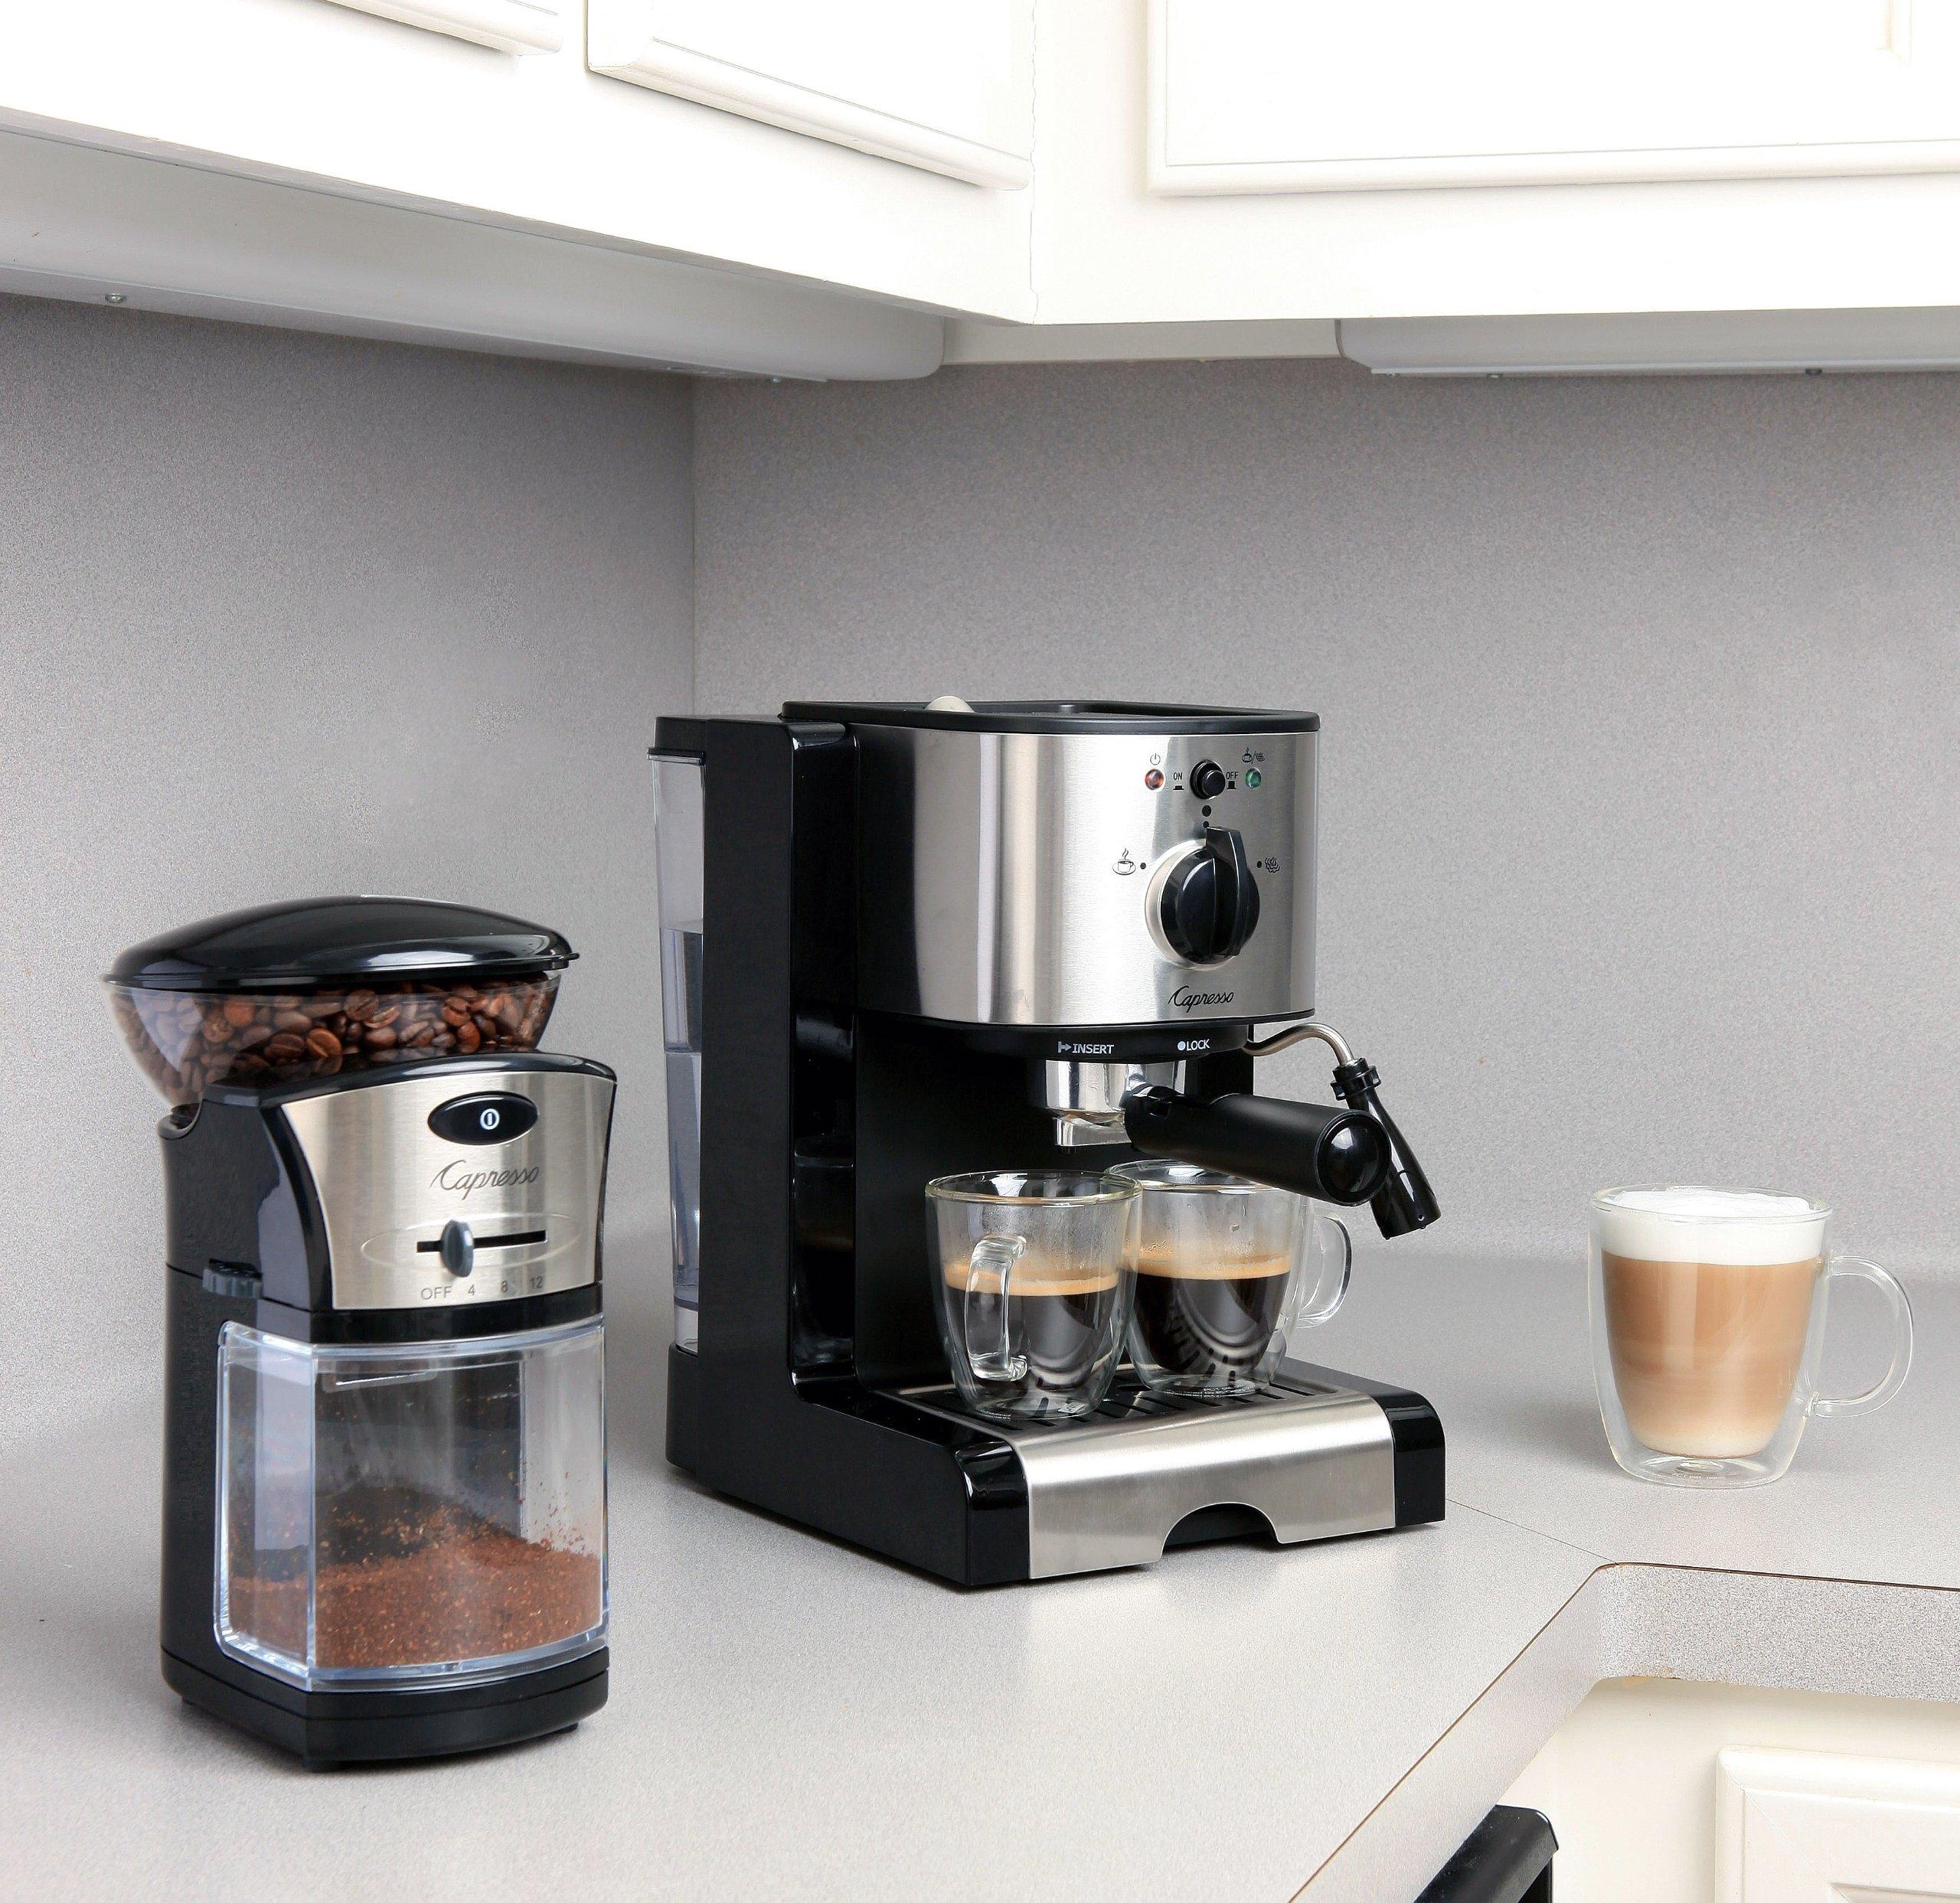 Capresso 116.04 Pump Espresso and Cappuccino Machine EC100, Black and Stainless by Capresso (Image #3)